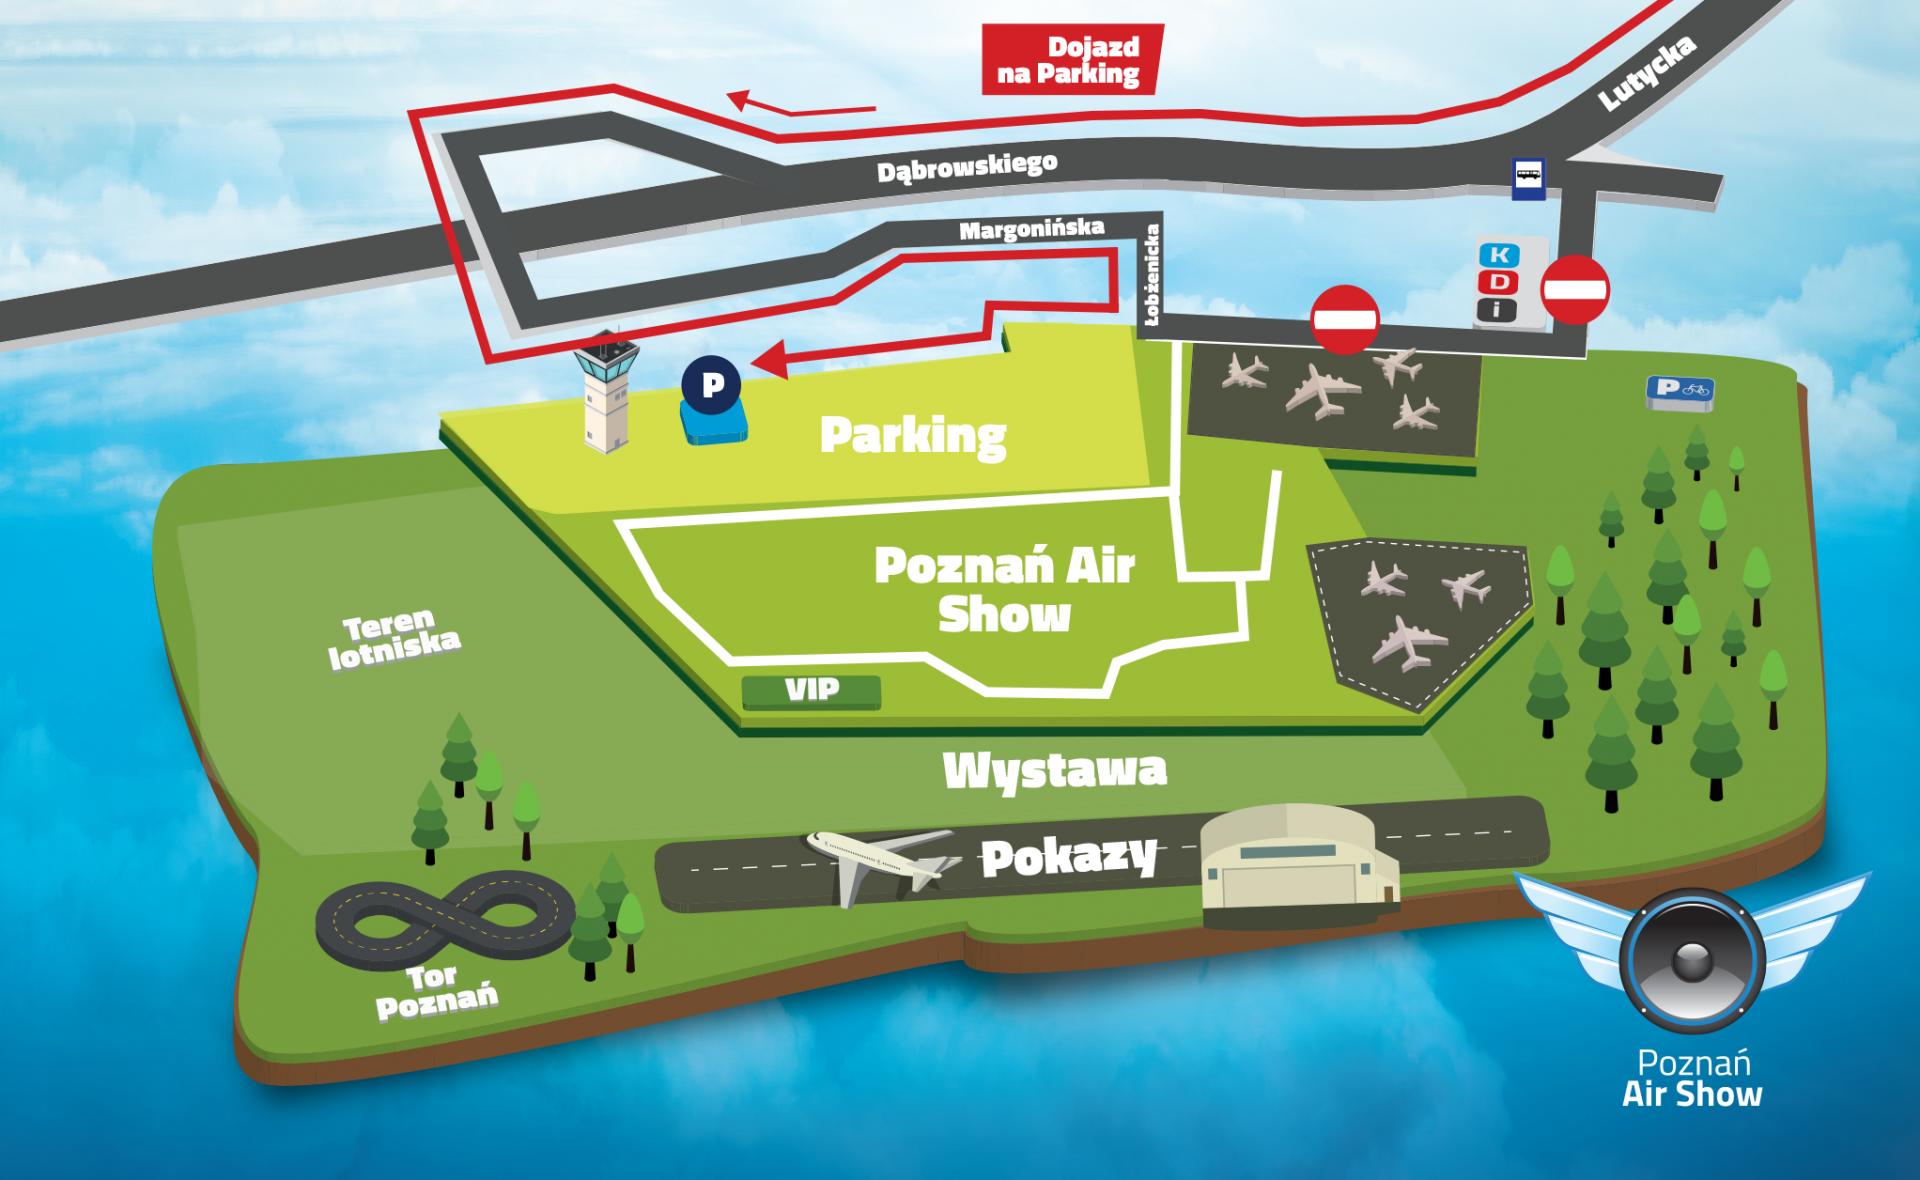 Poznań Air Show